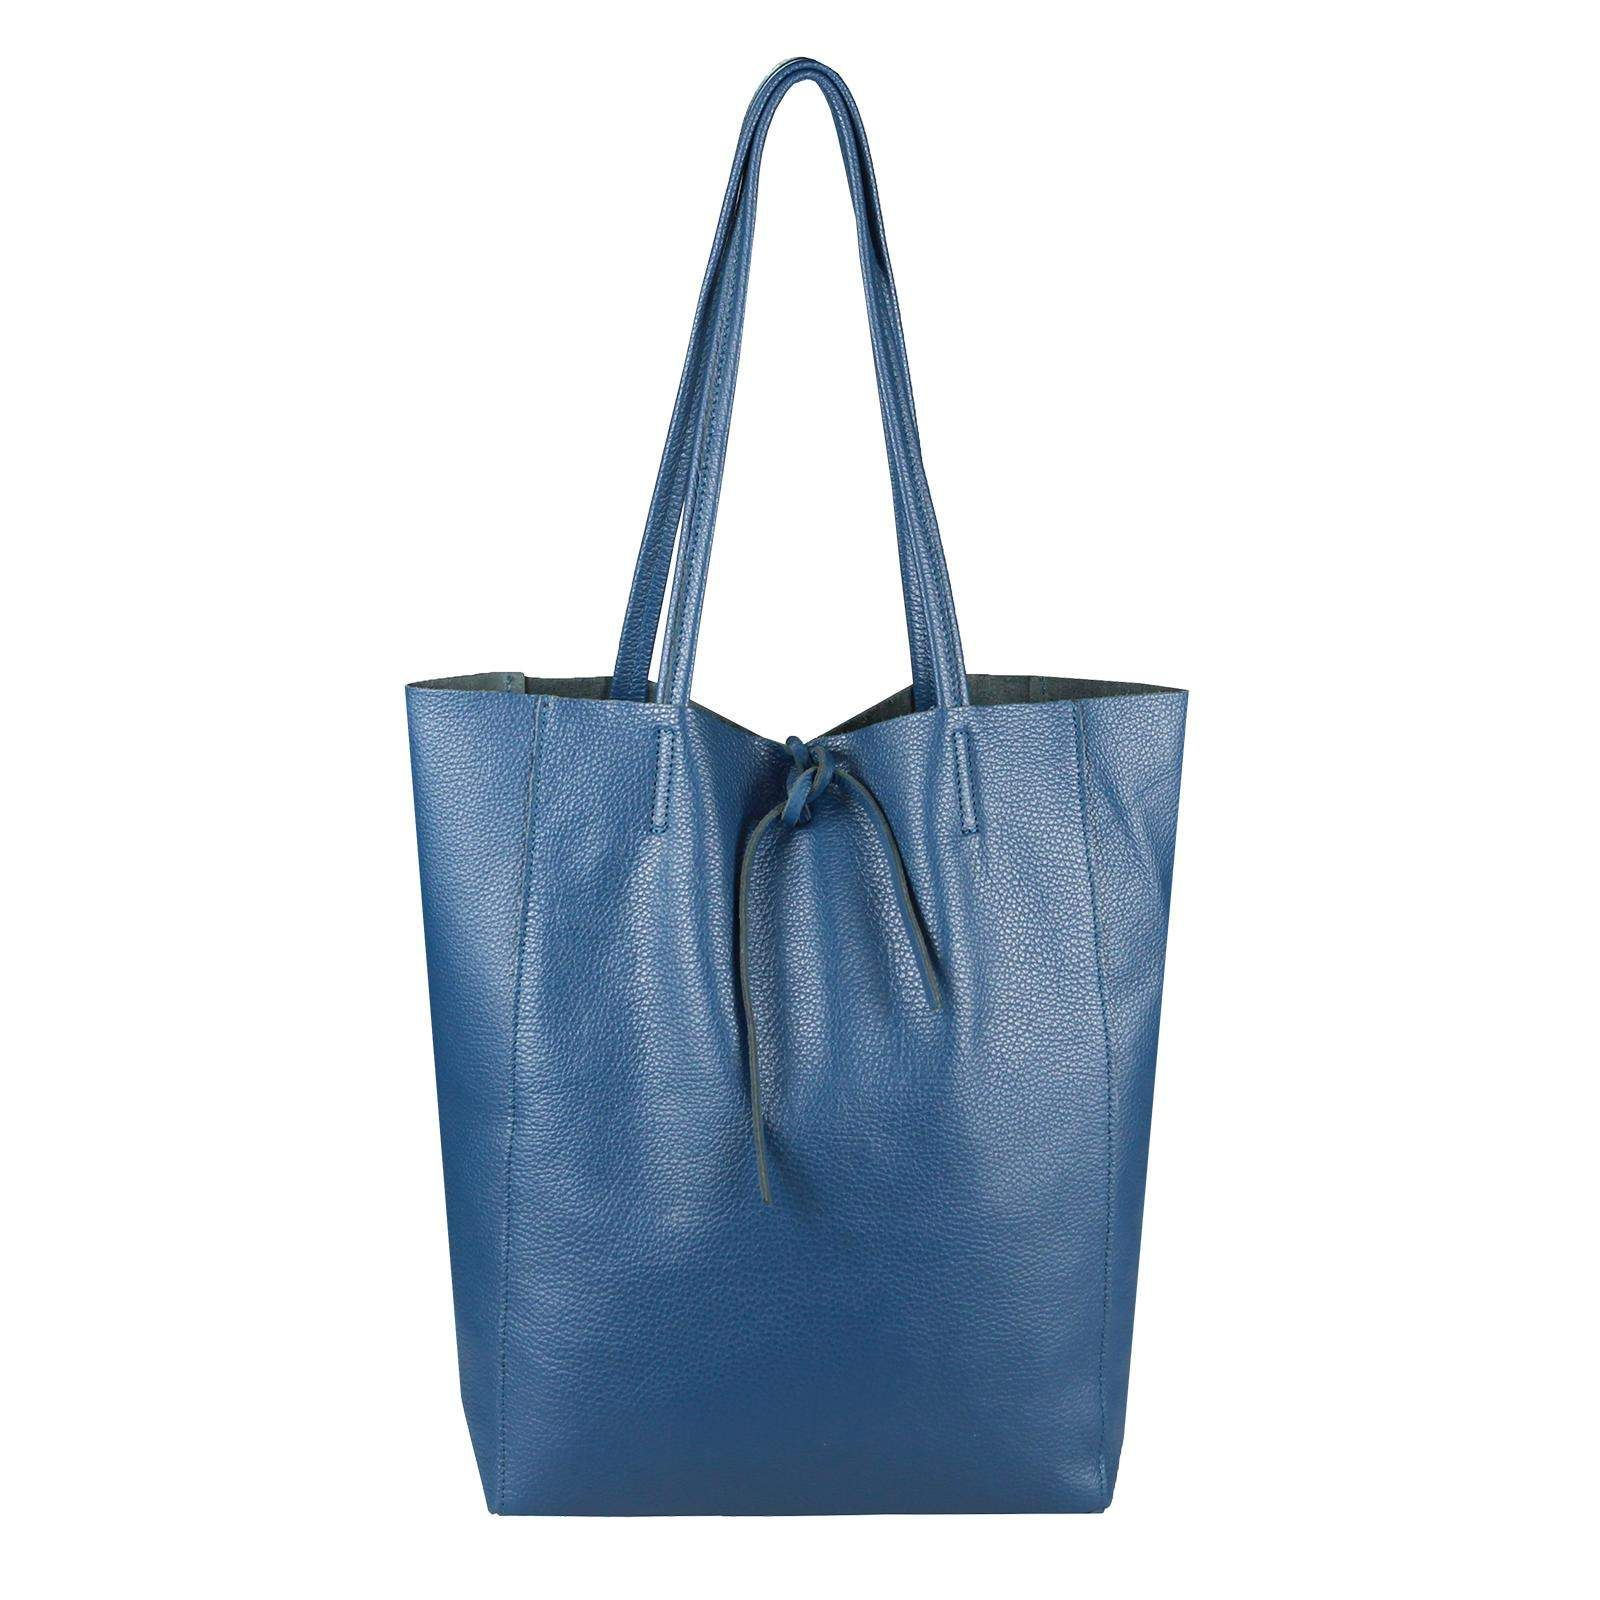 62c3a8fb5a3f1 Made in Italy DAMEN LEDER TASCHE DIN-A4 Shopper Schultertasche Henkeltasche  Tote Bag Metallic